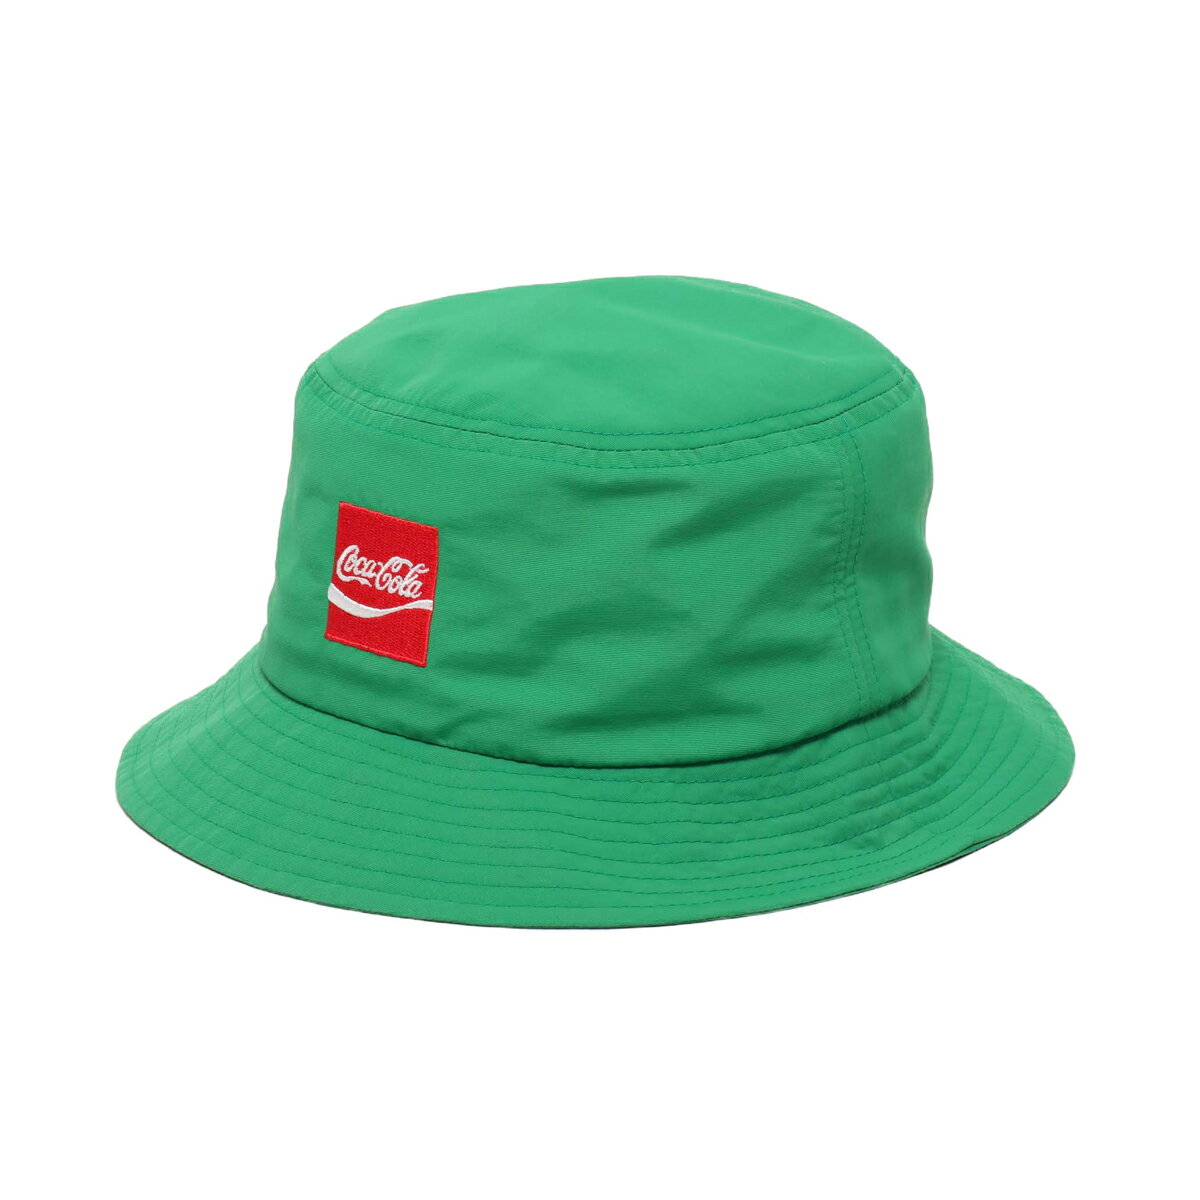 COCA COLA by ATMOS LAB NYLON BUCKET HAT(コカコーラ バイ アトモスラボ ナイロン バケット ハット)GREEN【メンズ ハット】19SS-S